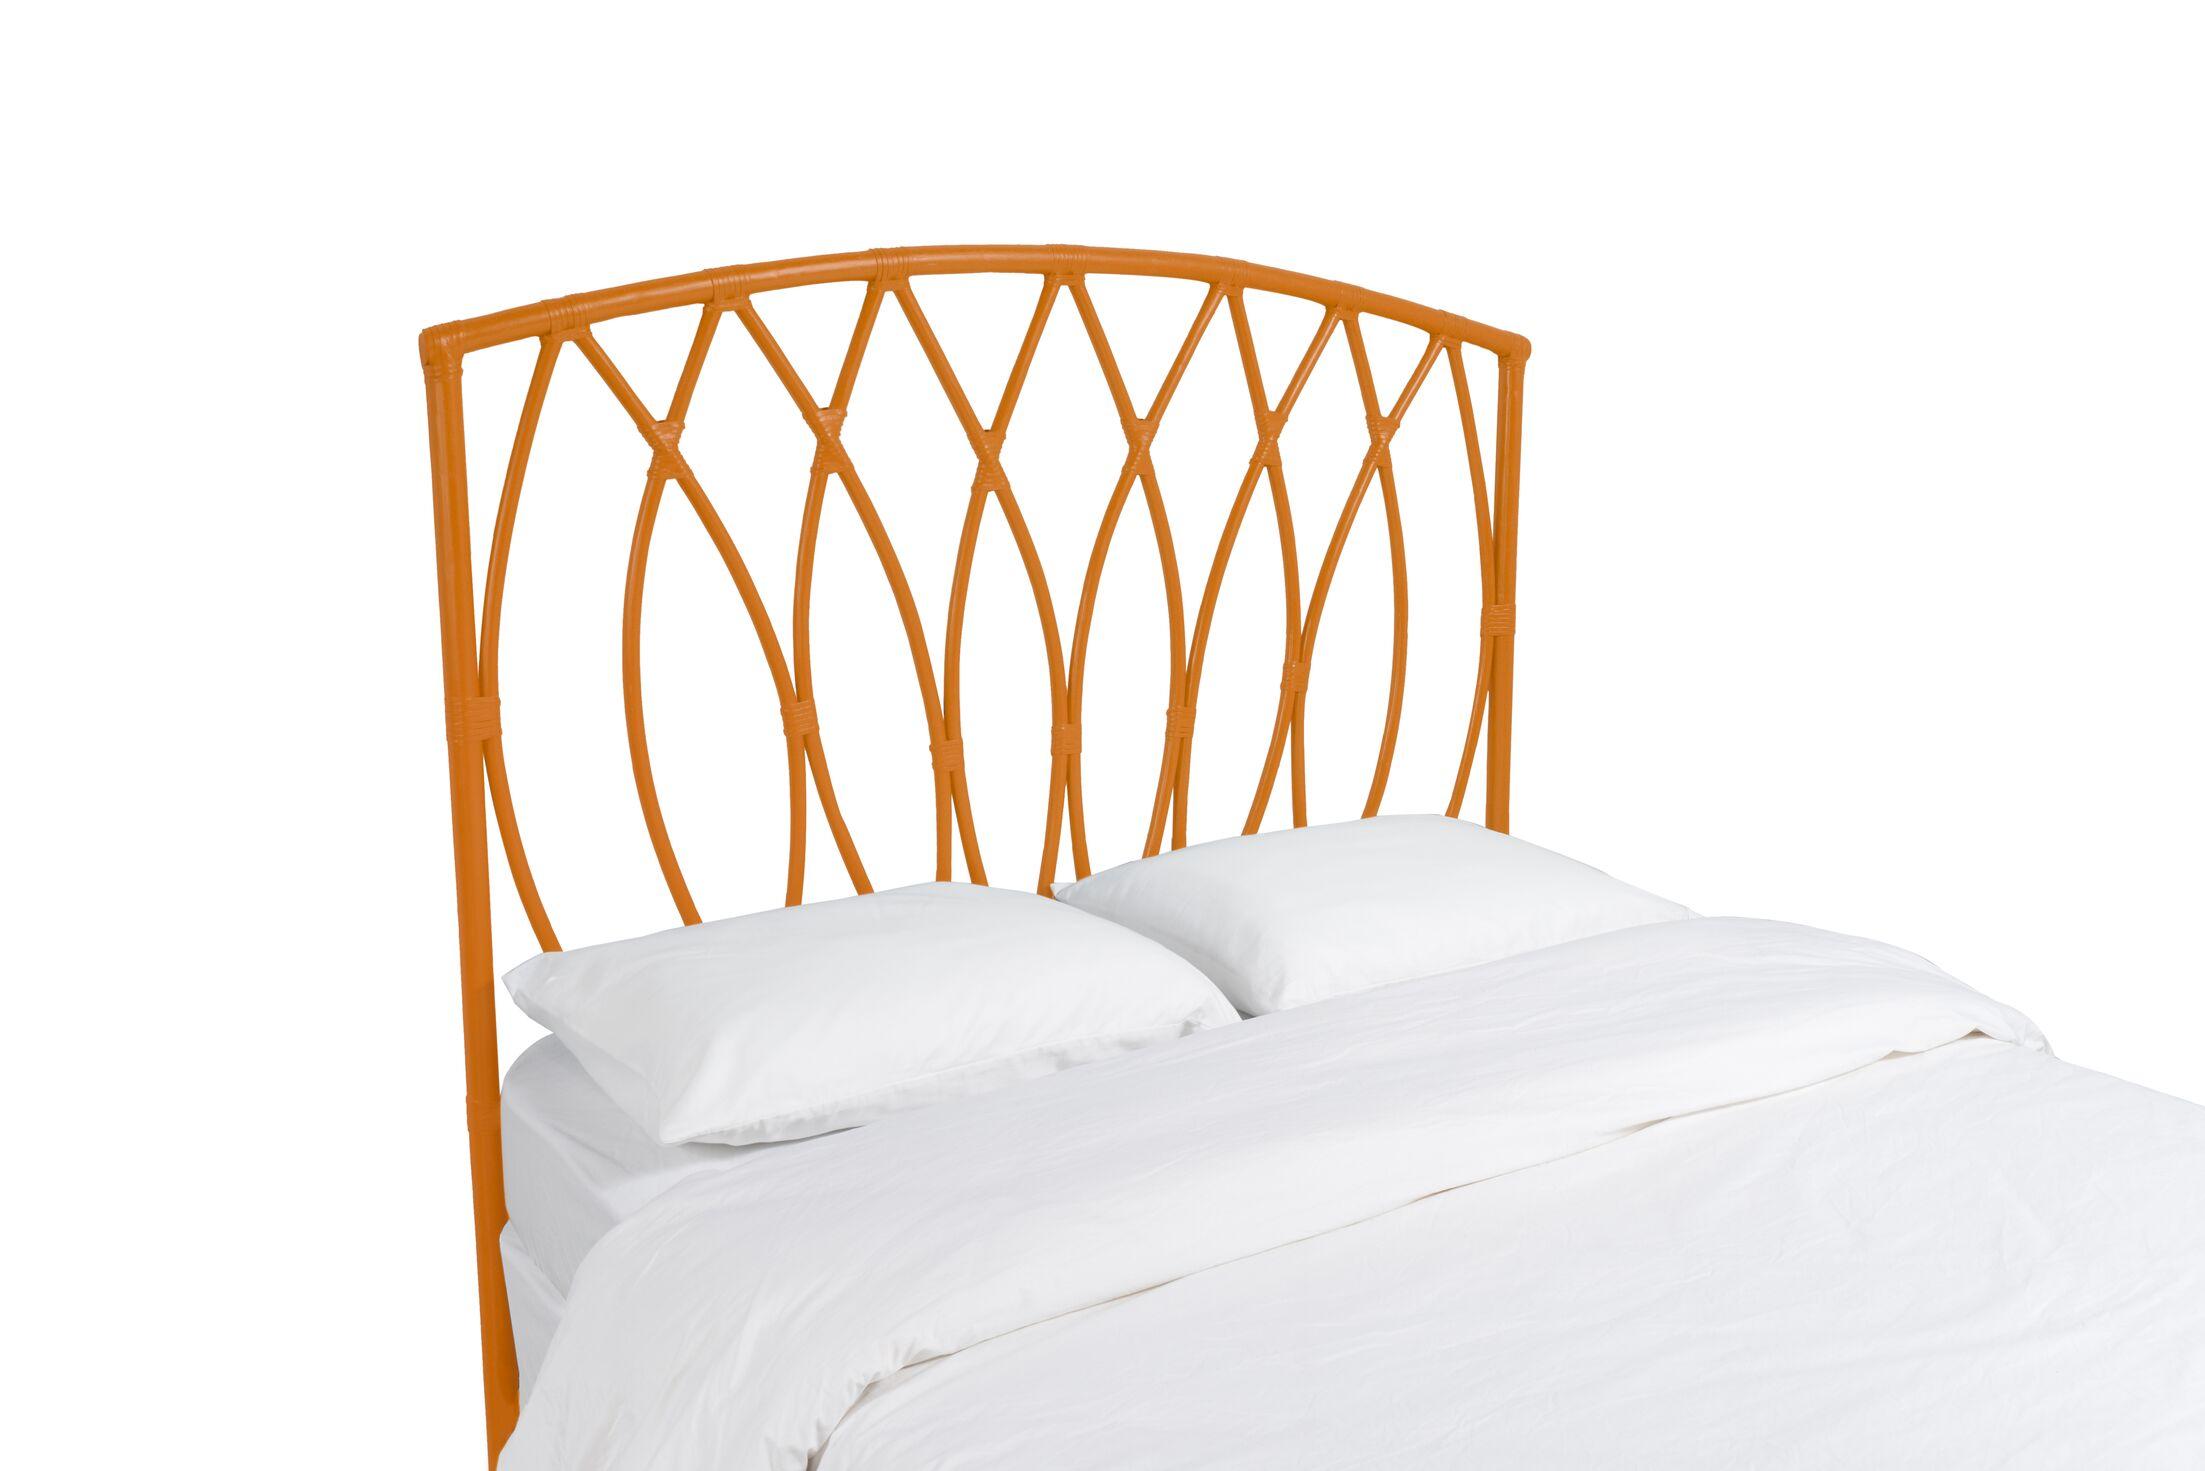 Royal Palm Open Frame Headboard Color: Citrus Orange, Size: King